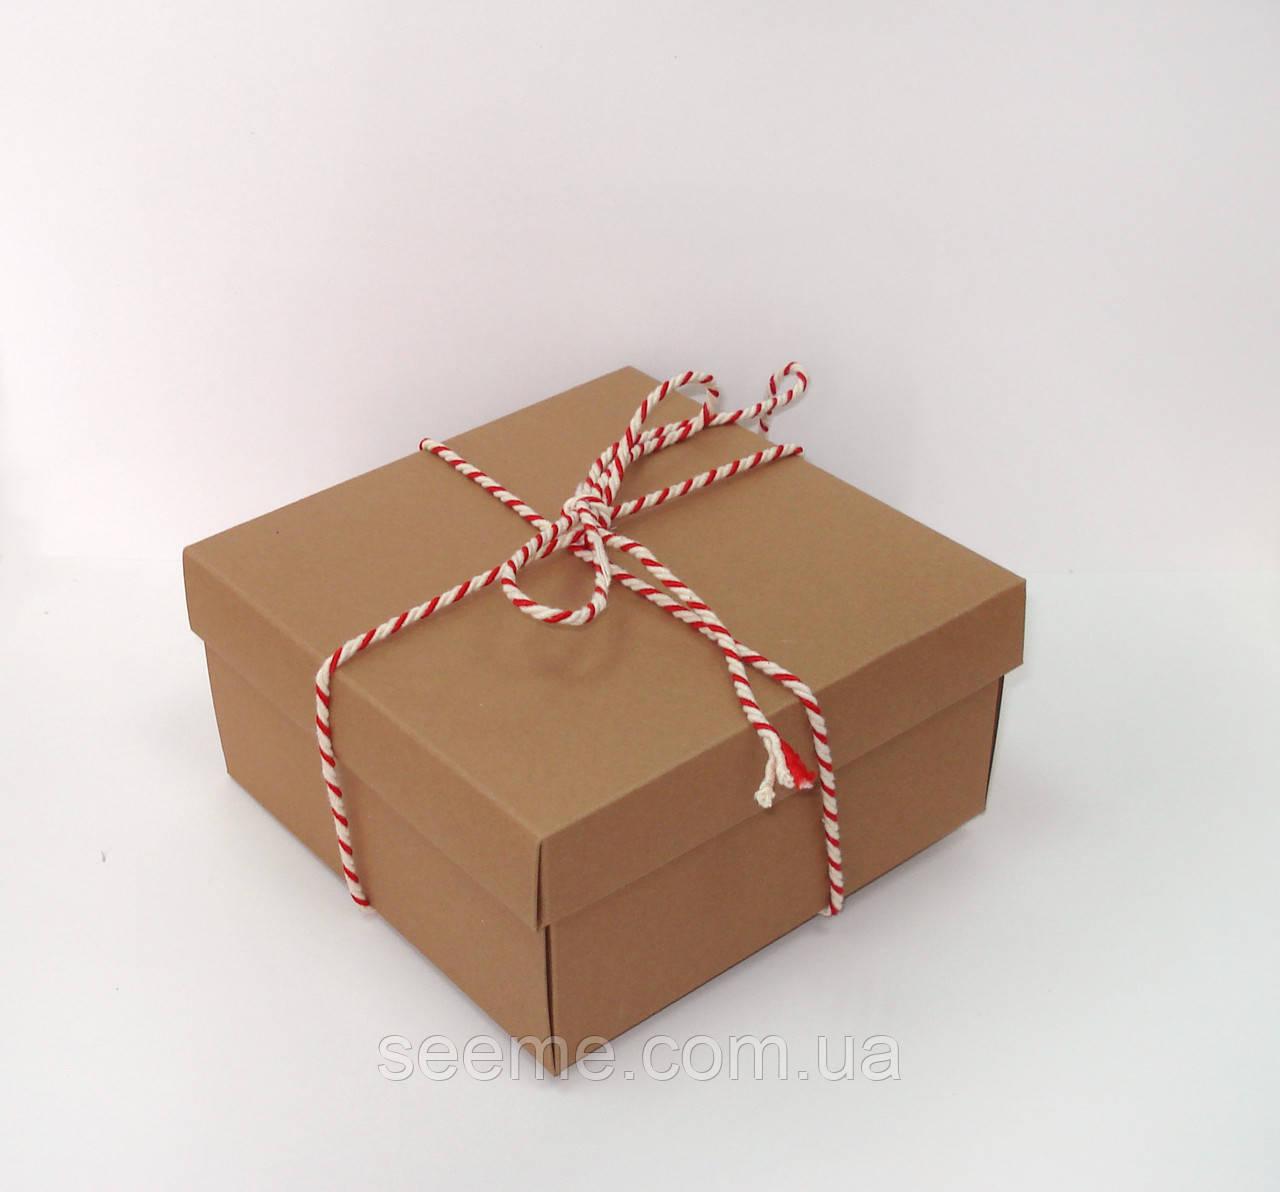 Коробка подарочная 140х140х70 мм, цвет крафт - SEE ME в Одессе